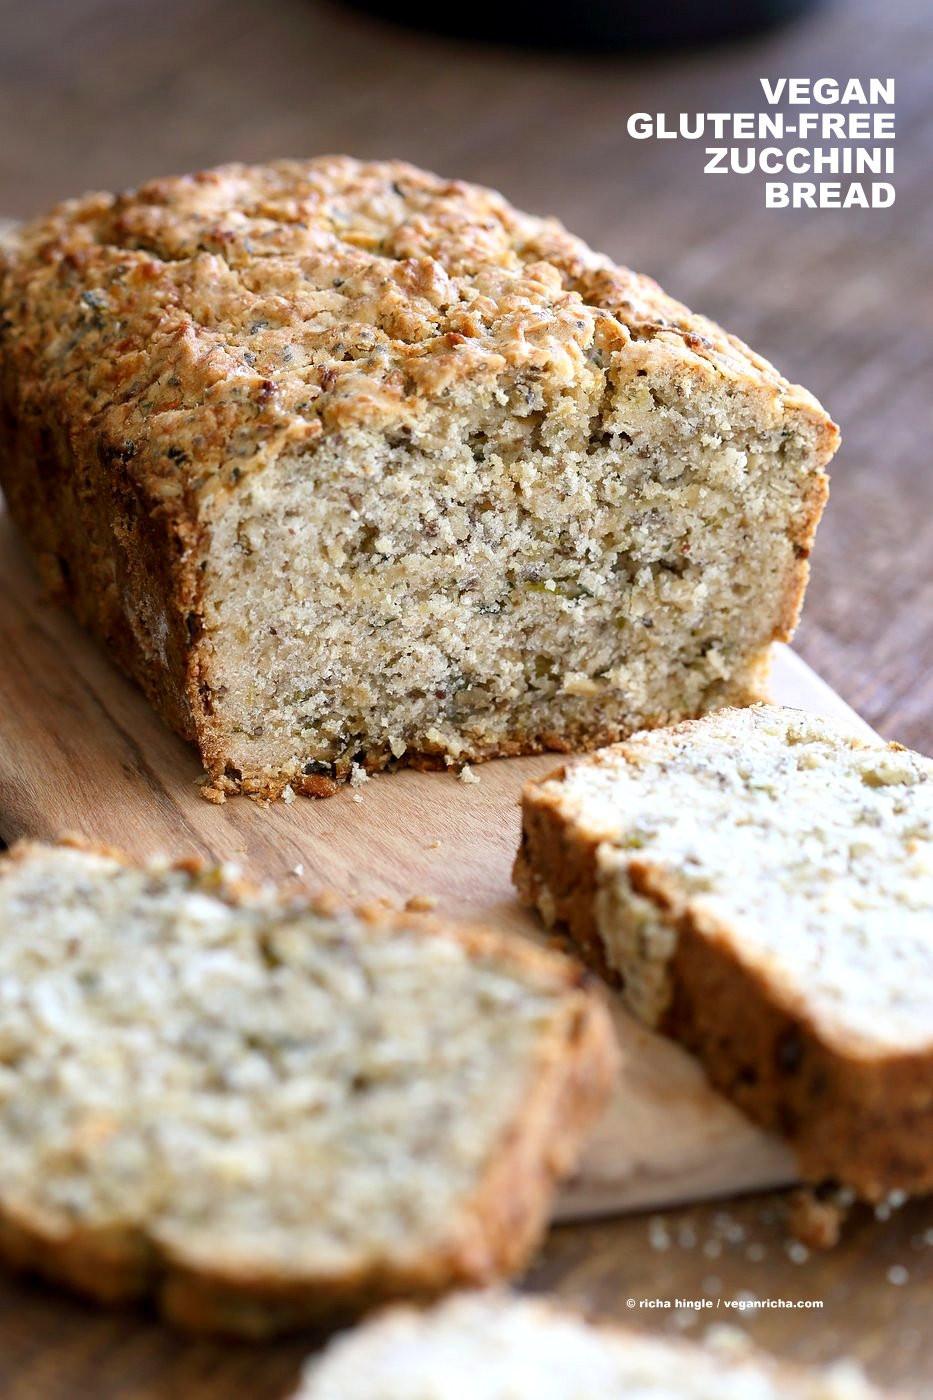 Is There Vegan Bread  Vegan Gluten free Zucchini Bread Recipe Vegan Richa